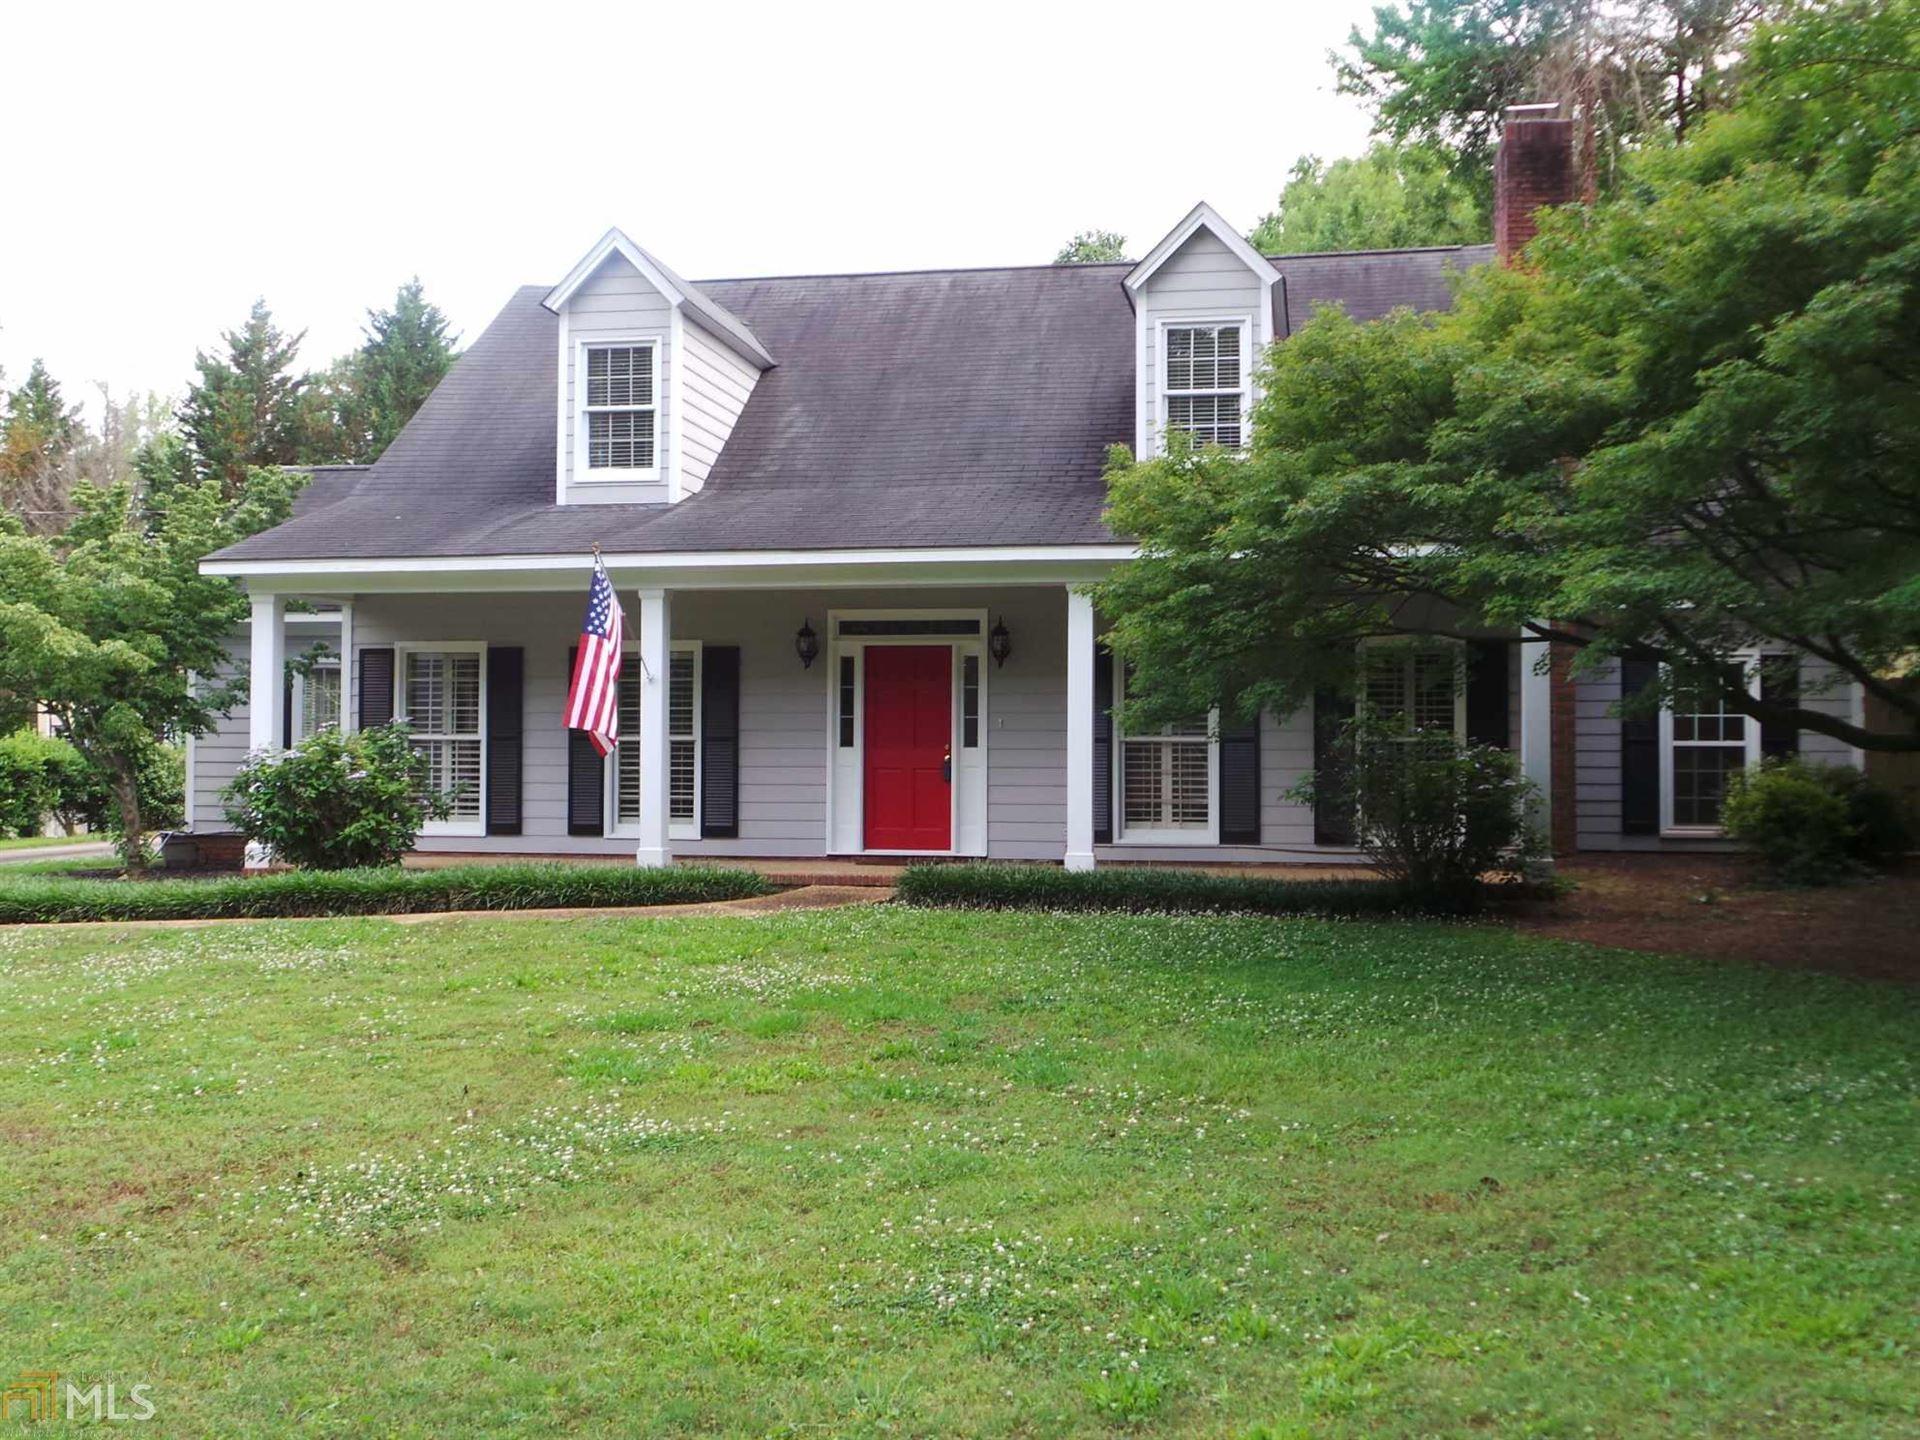 505 Cherokee, LaGrange, GA 30240 - #: 8792811